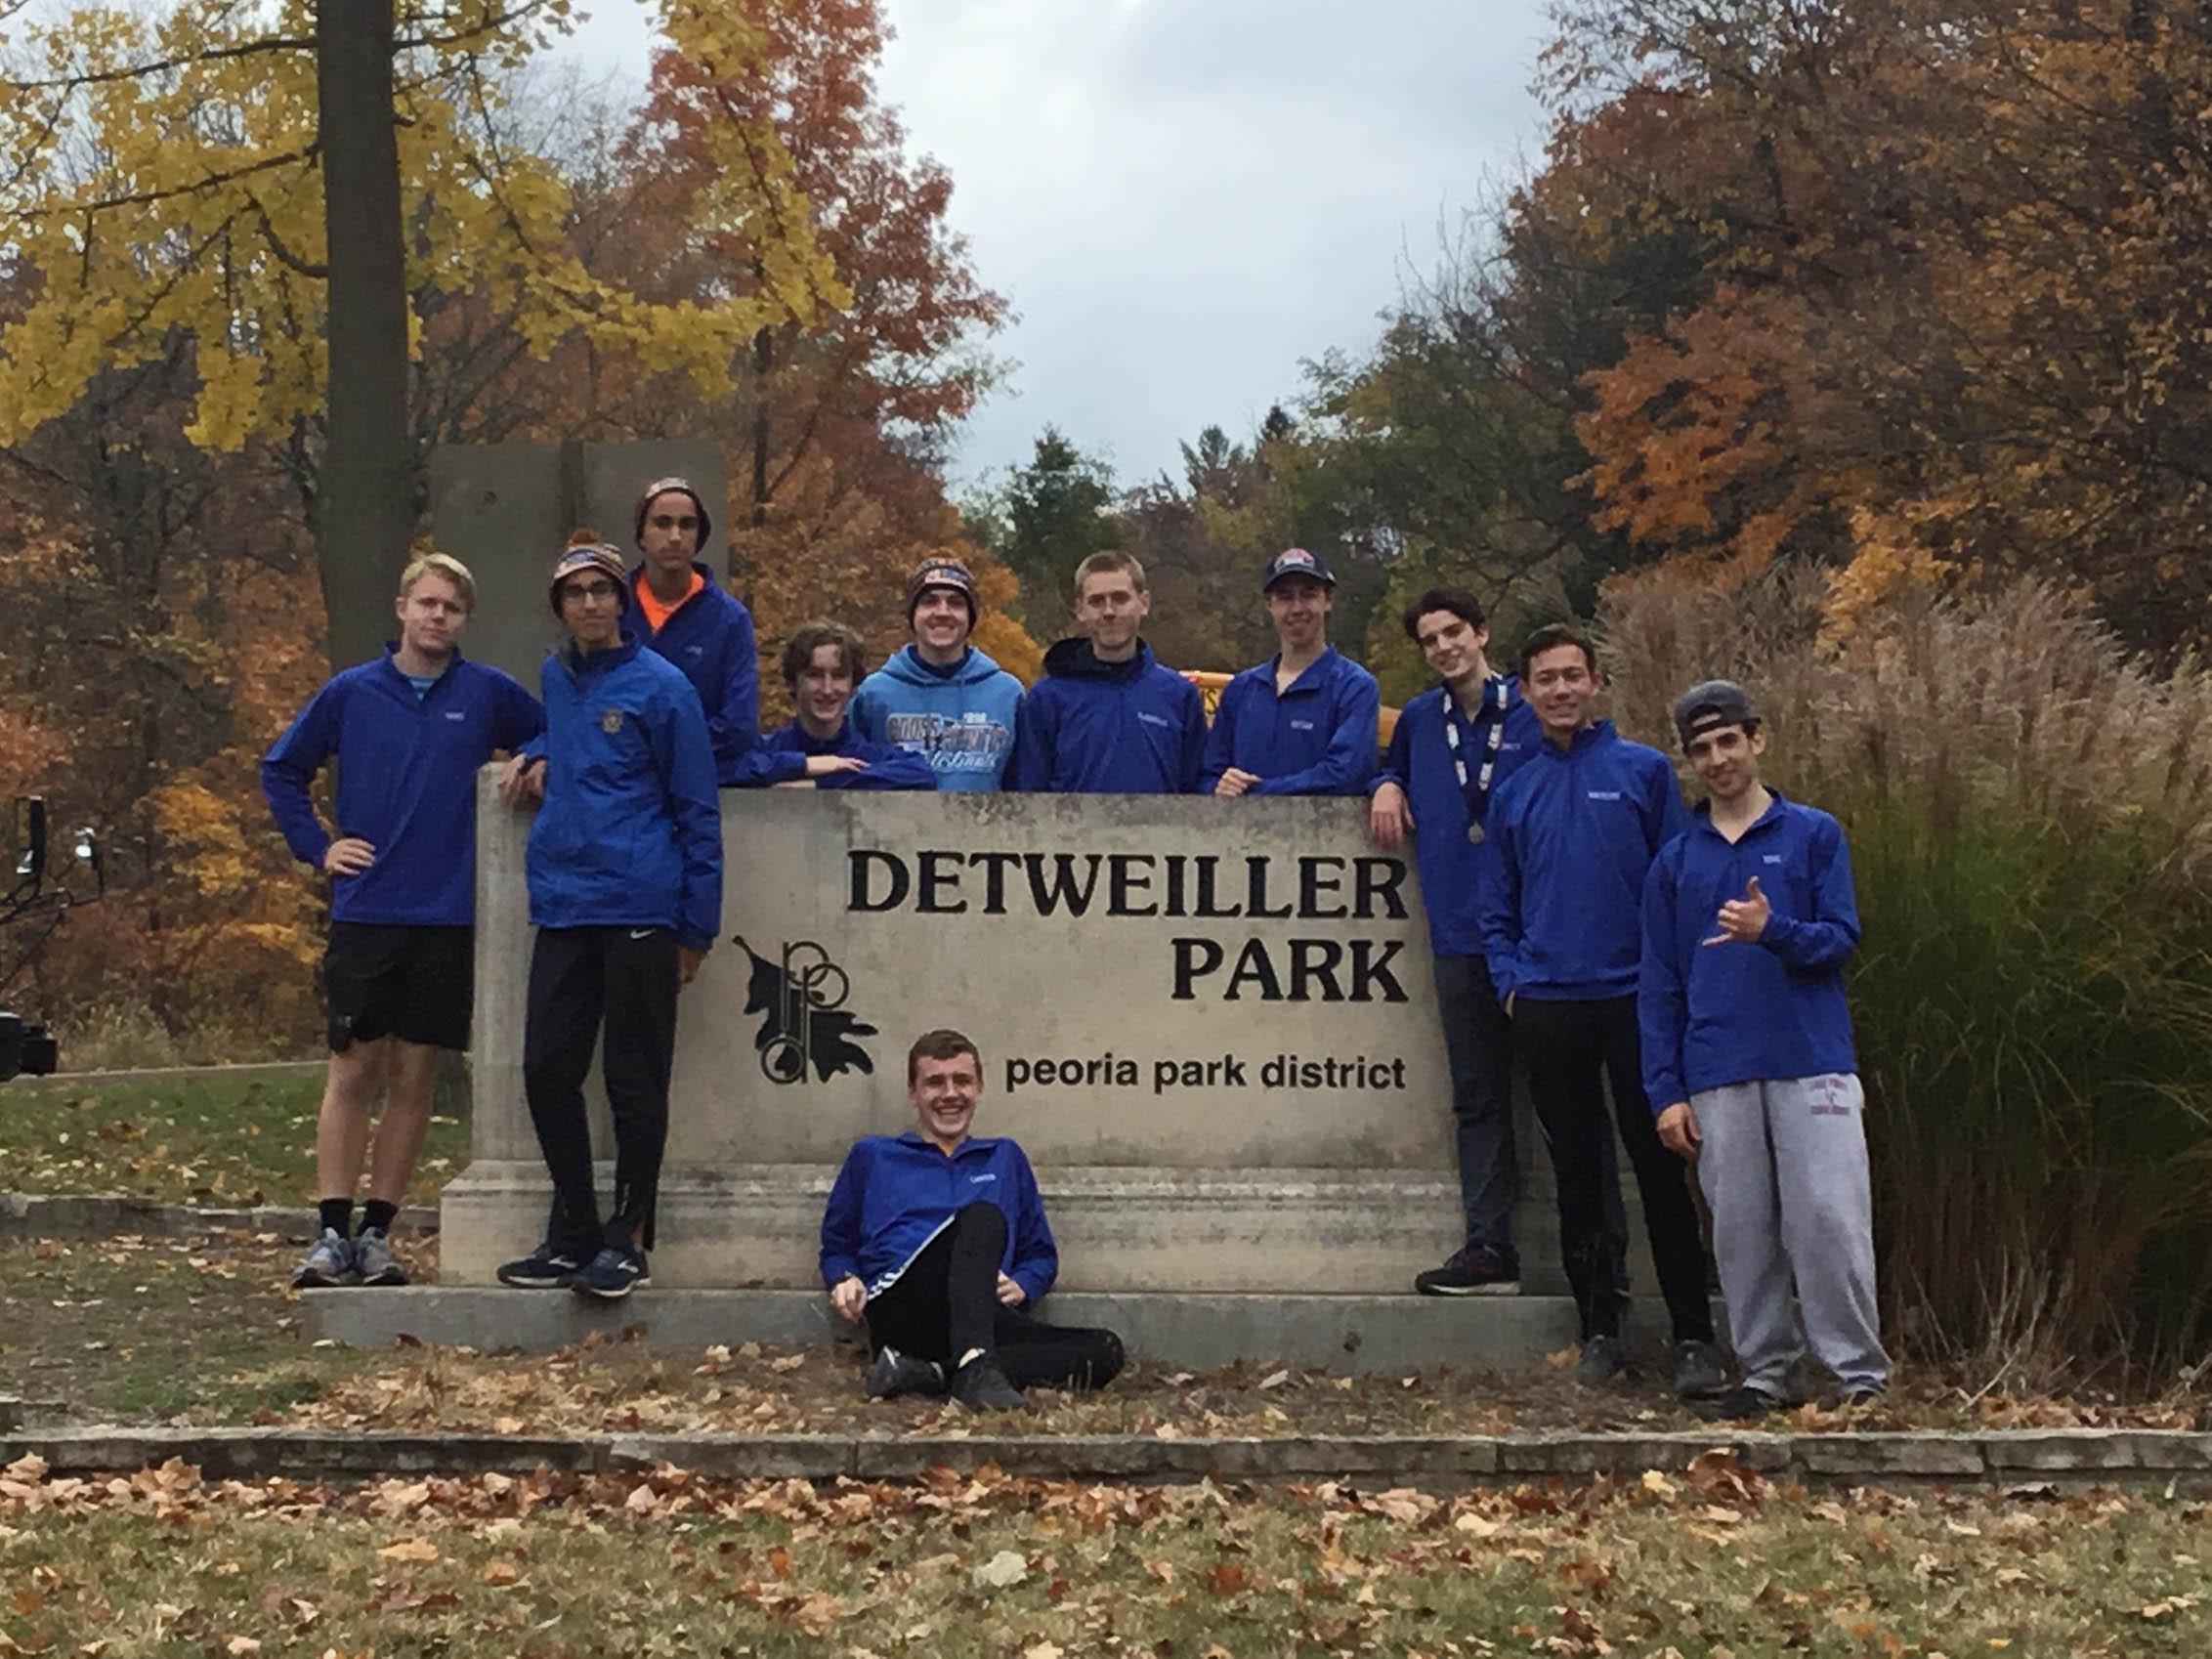 Boysi Cross Country Team at Detweiller Park.